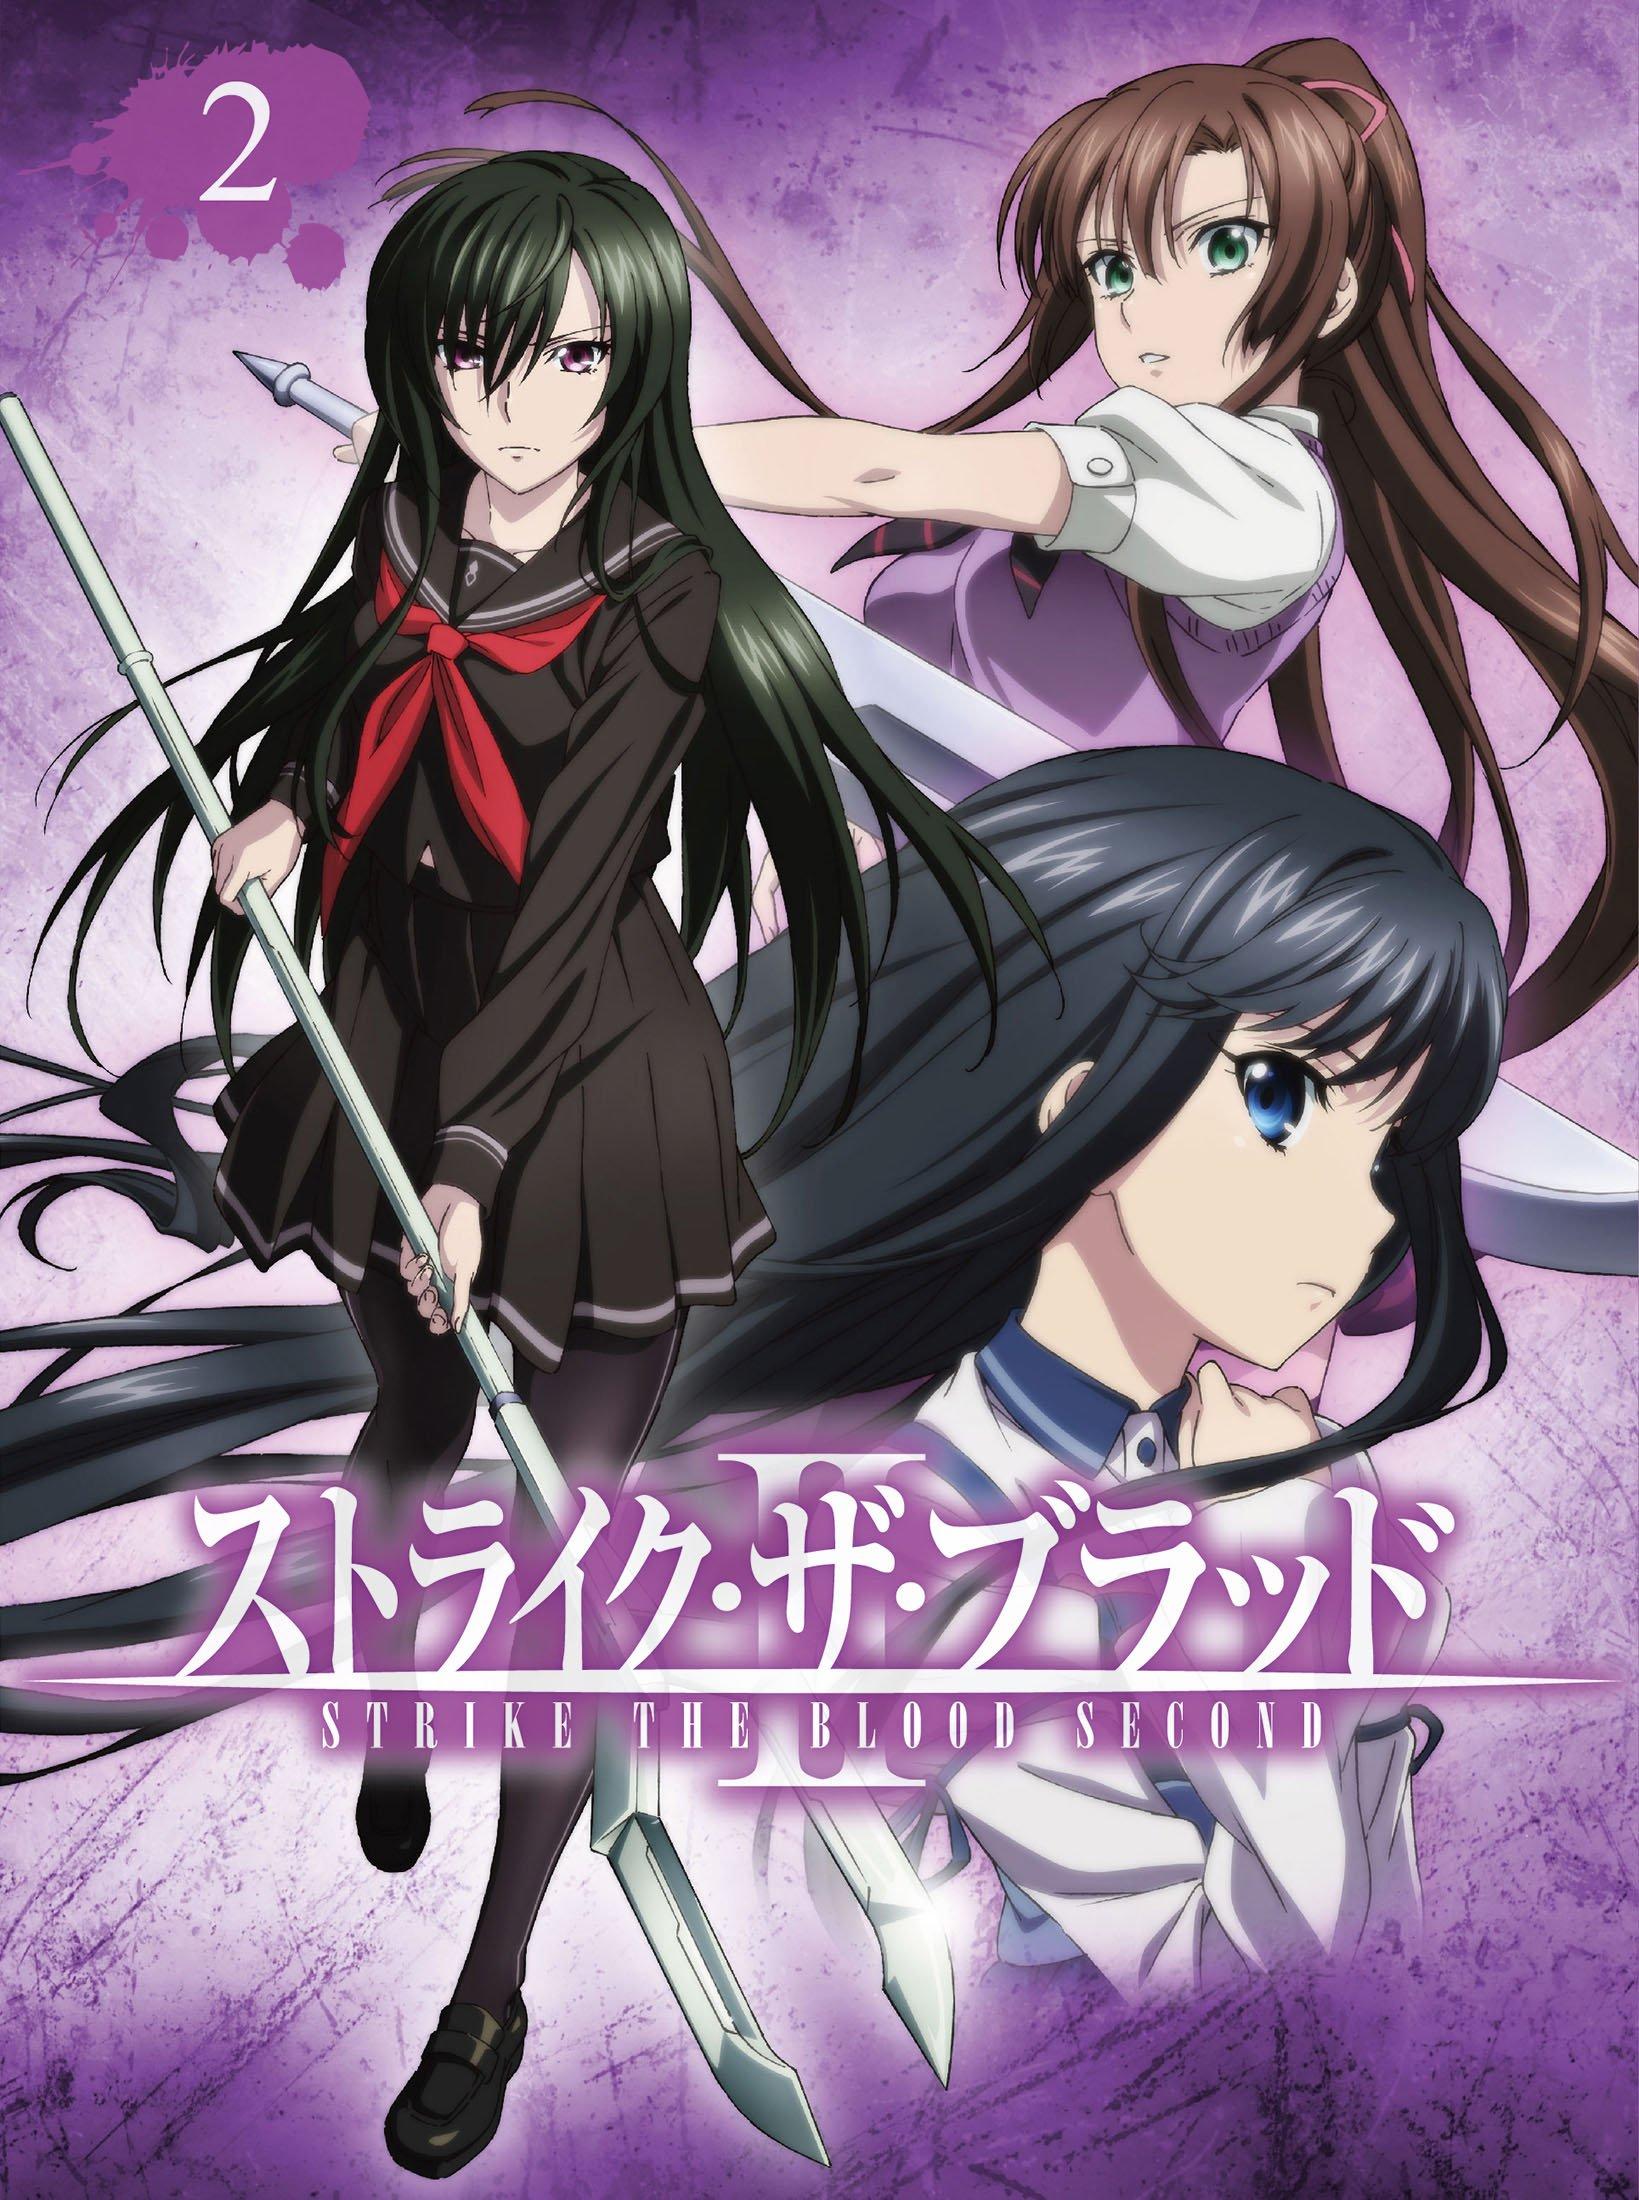 Mua ストライク ザ ブラッド Ii Ova Vol 2 初回仕様版 Blu Ray Tren Amazon Nhật Chinh Hang Fado